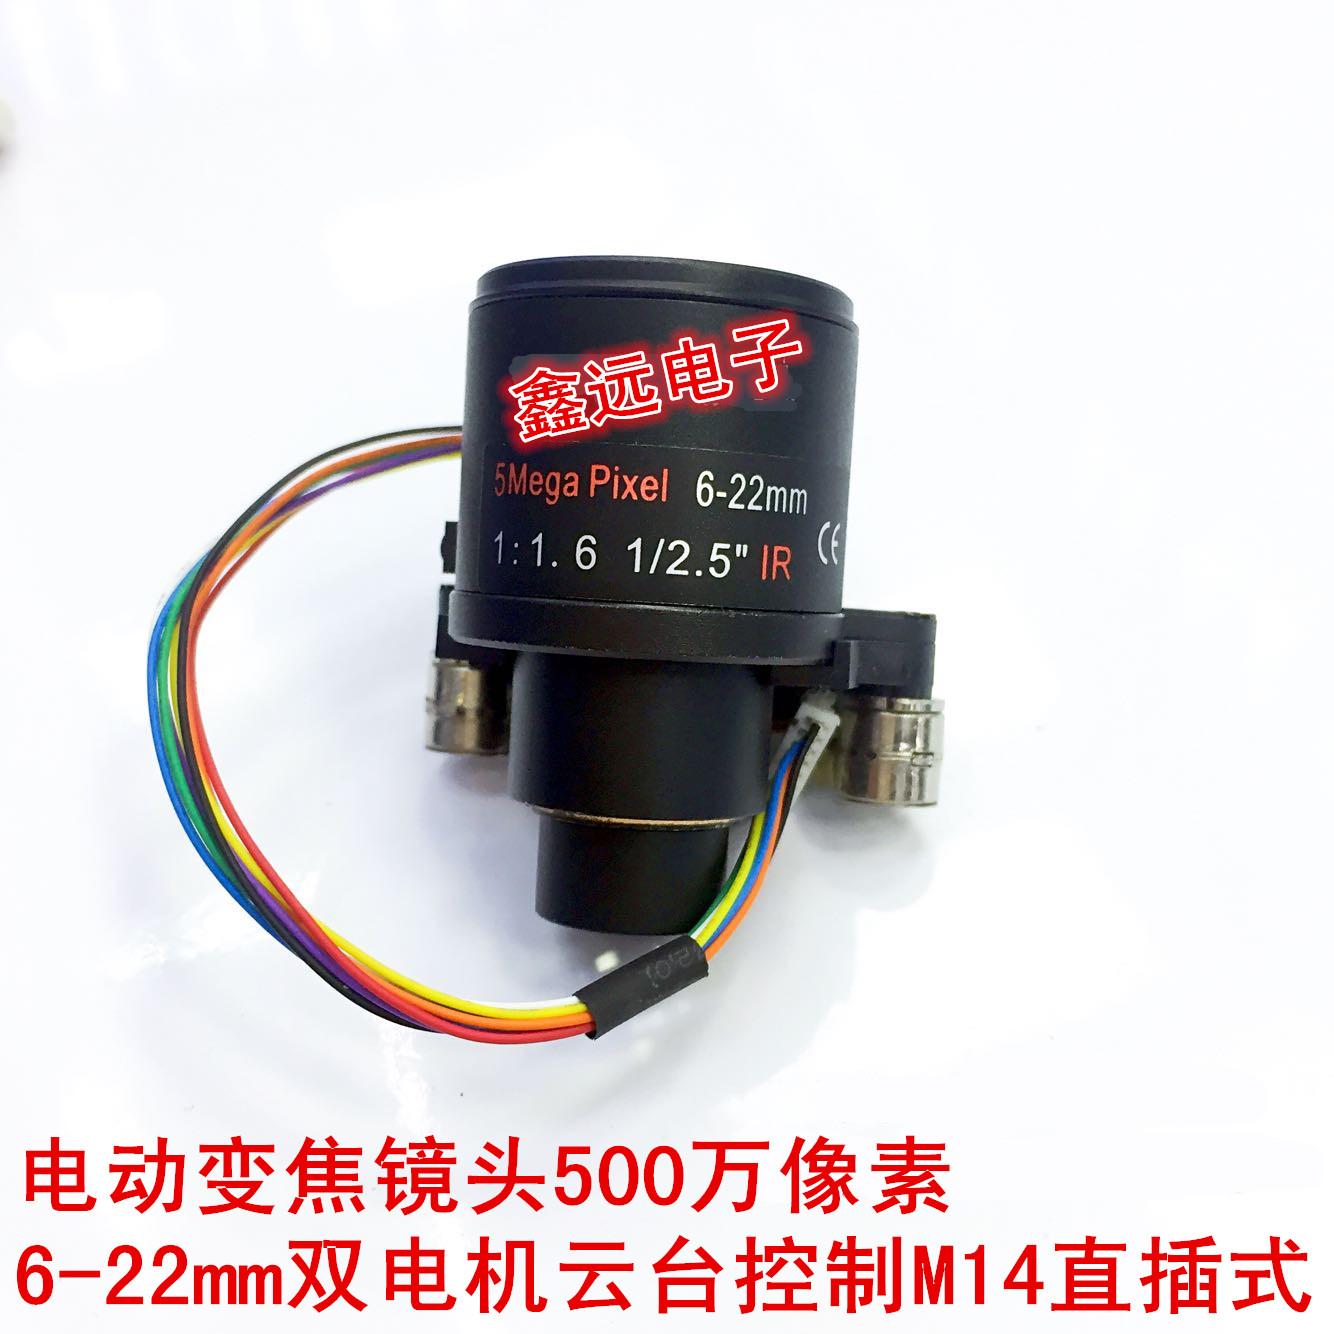 6-22mm electric zoom lens 5 megapixel dual motor PTZ control M14 in-line CCTV lens